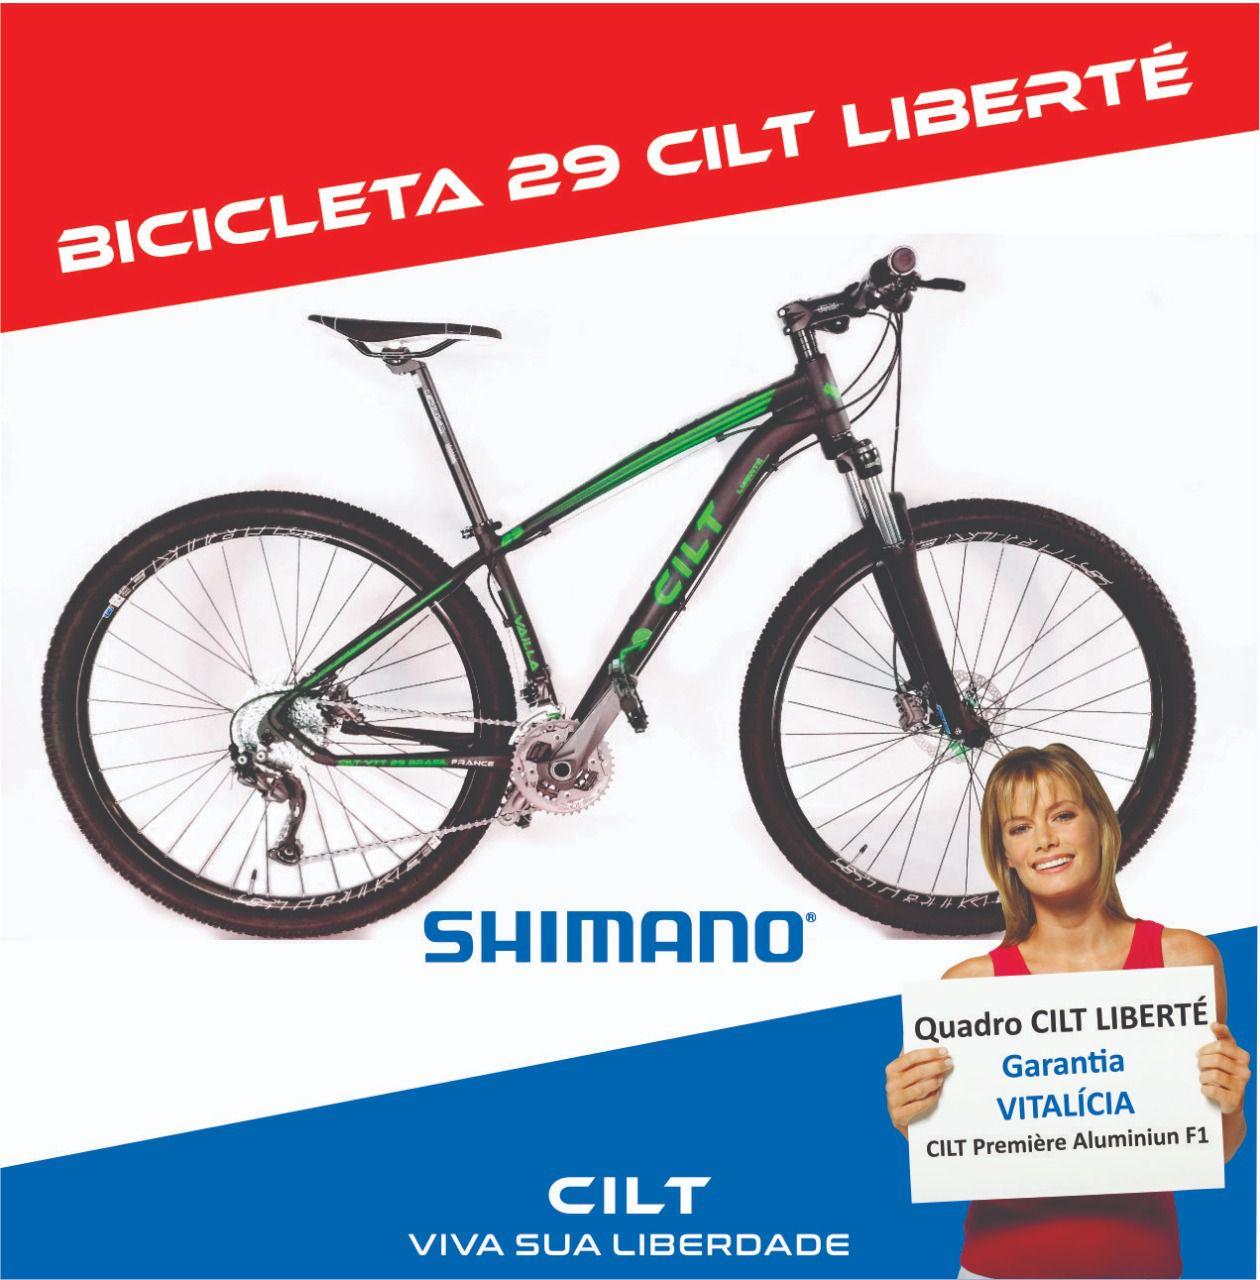 61ec715c8976e Bicicleta 29 Cilt Liberté Shimano Slx 11v Freio Hidráulico L11a ...